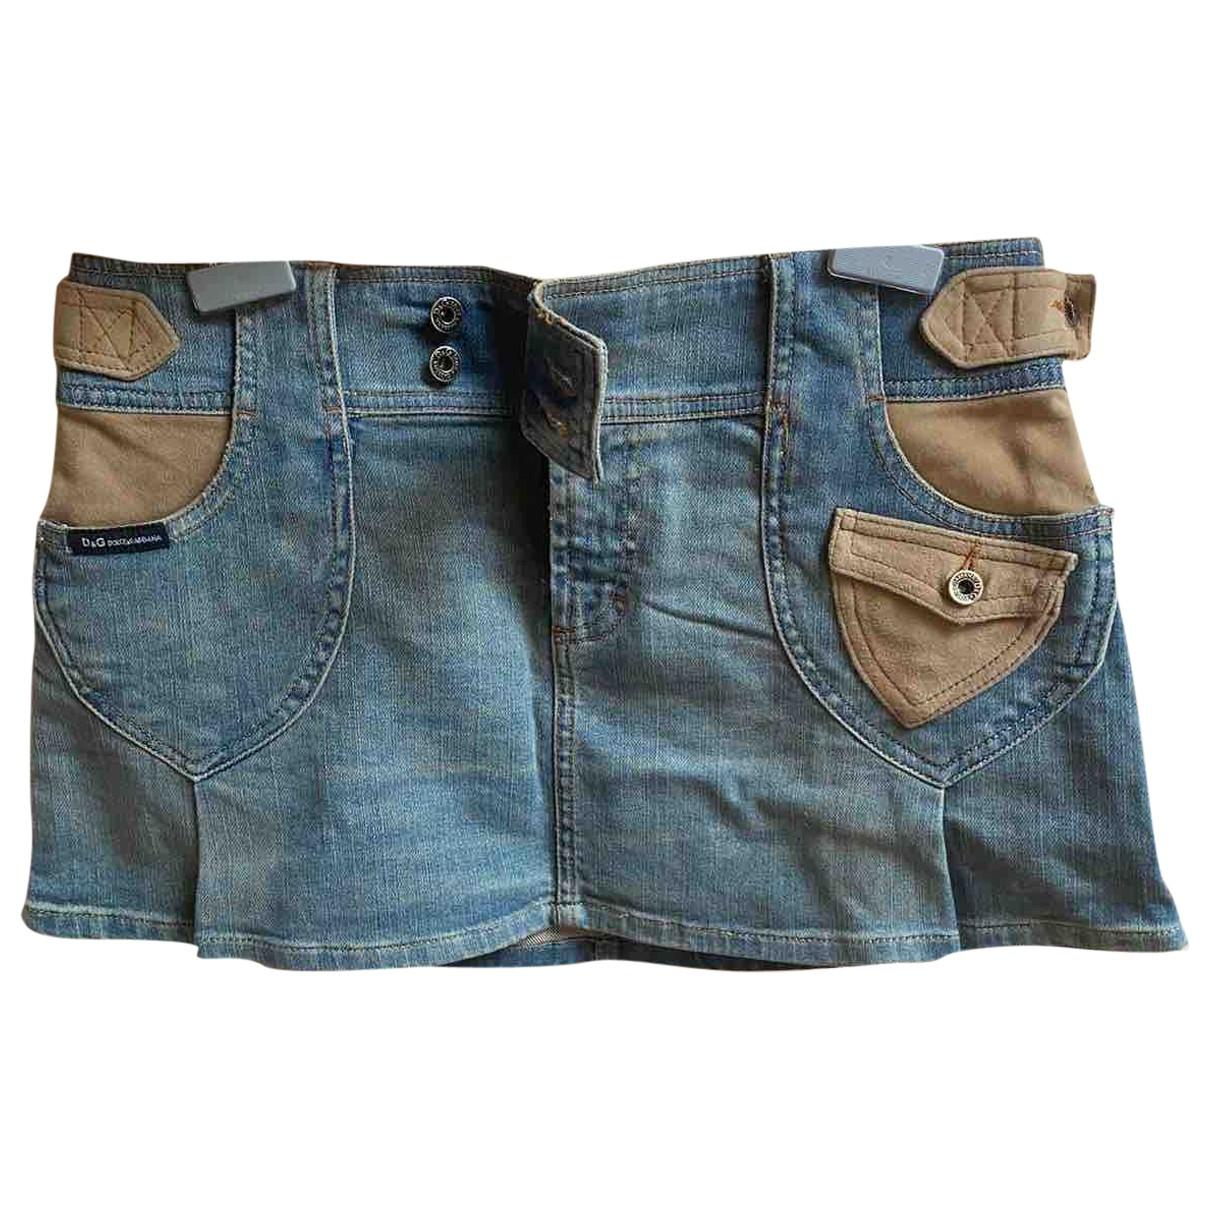 D&g \N Blue Cotton skirt for Women 40 IT